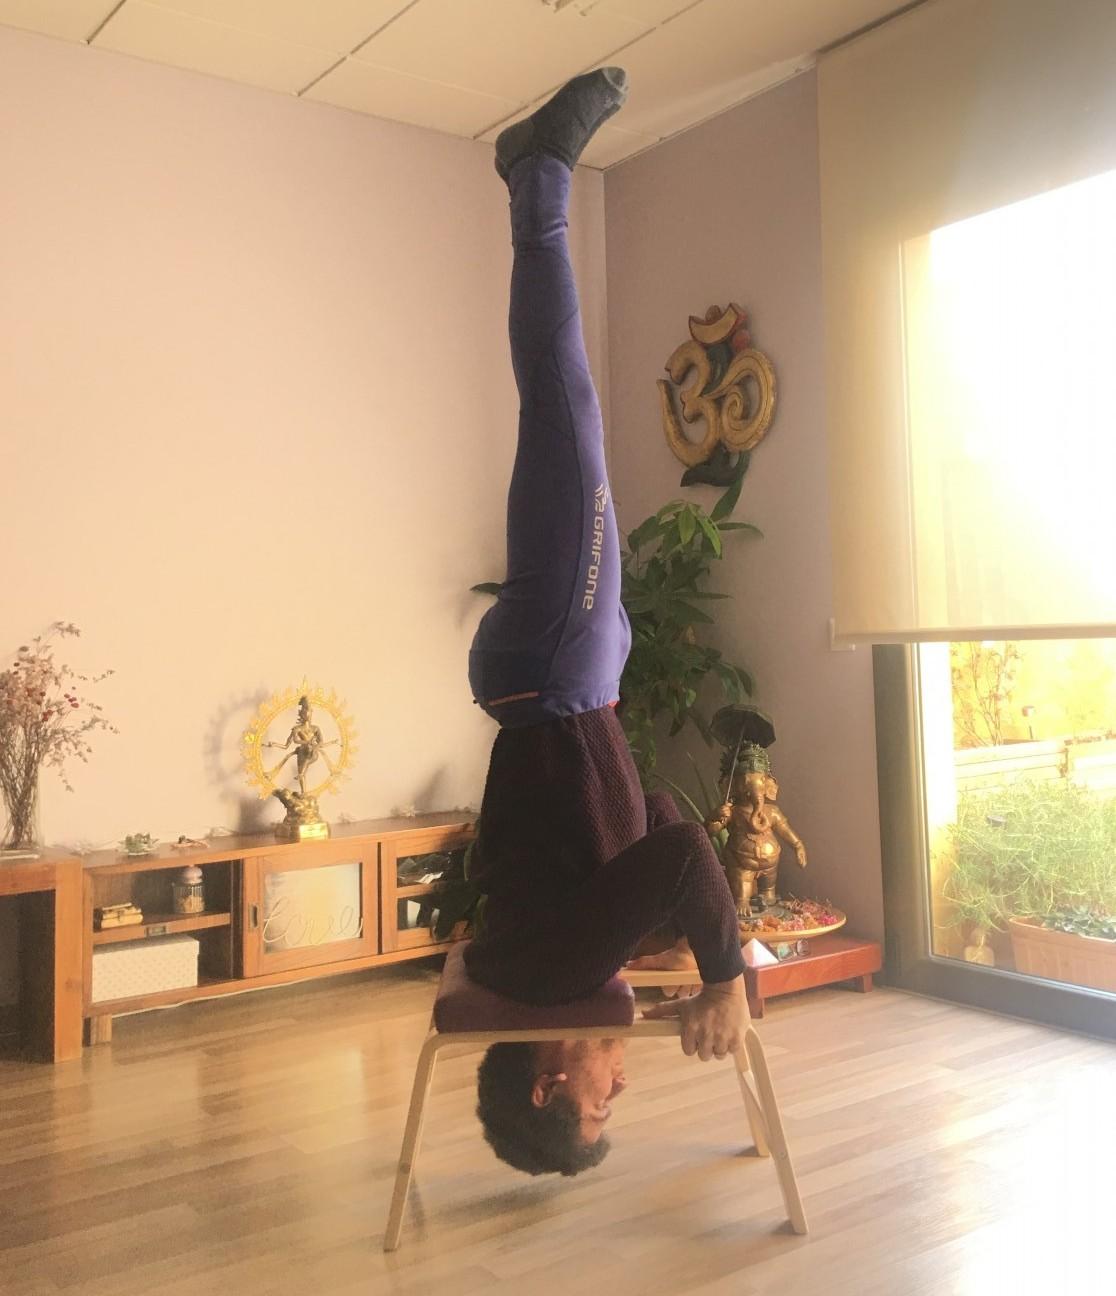 yoga a vic, feetup, yoga osna, el teu centre yoga, Nahuel Colet,sirsasana feetup